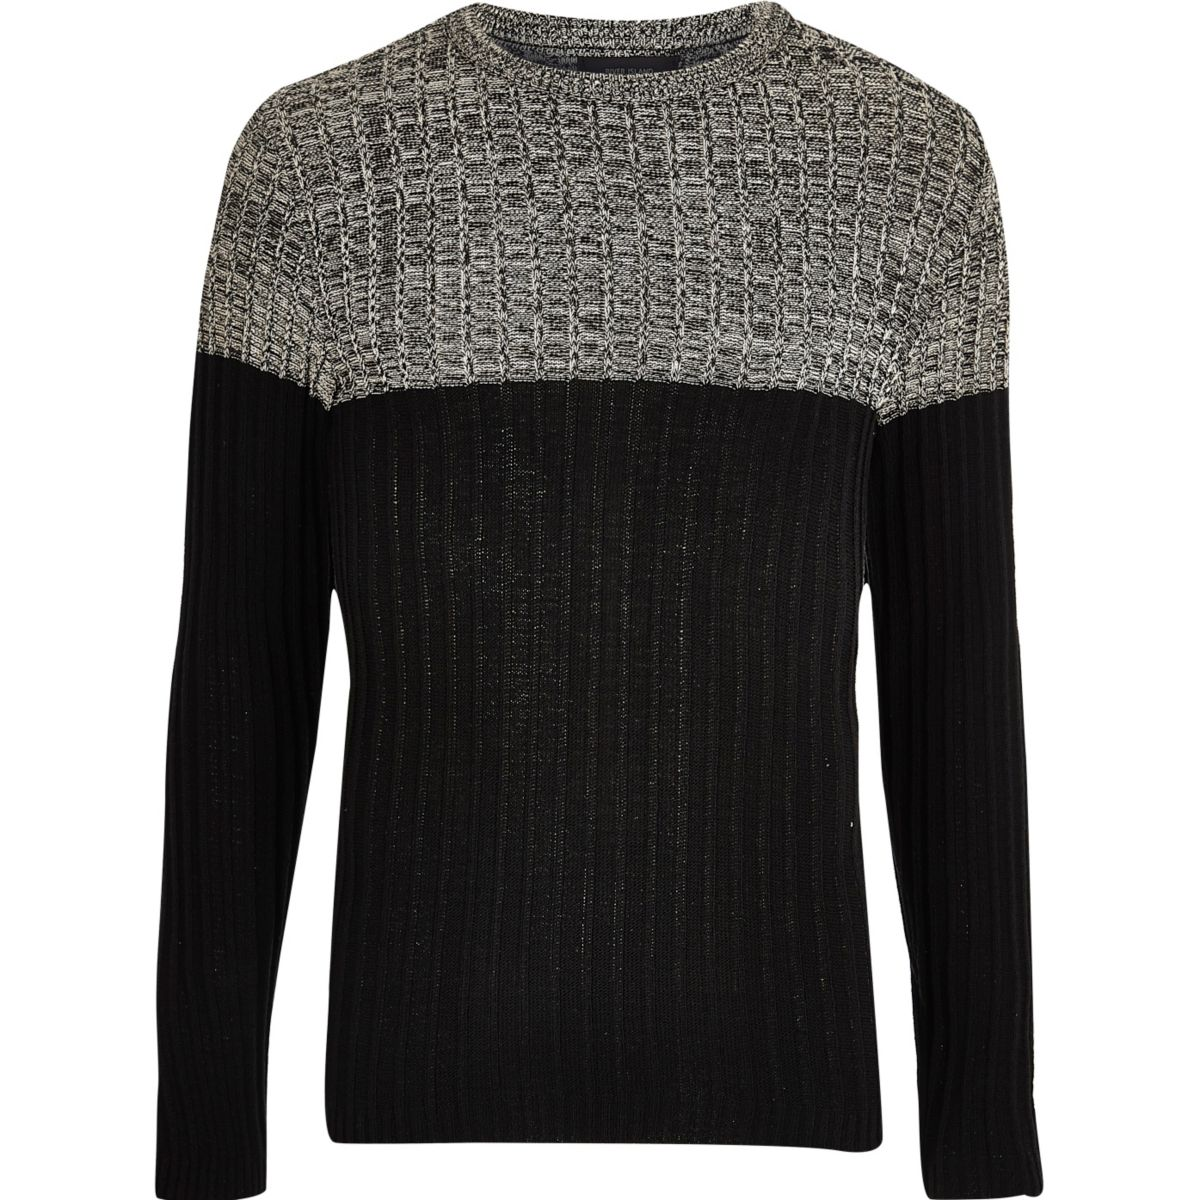 Stone ribbed knit colour block jumper